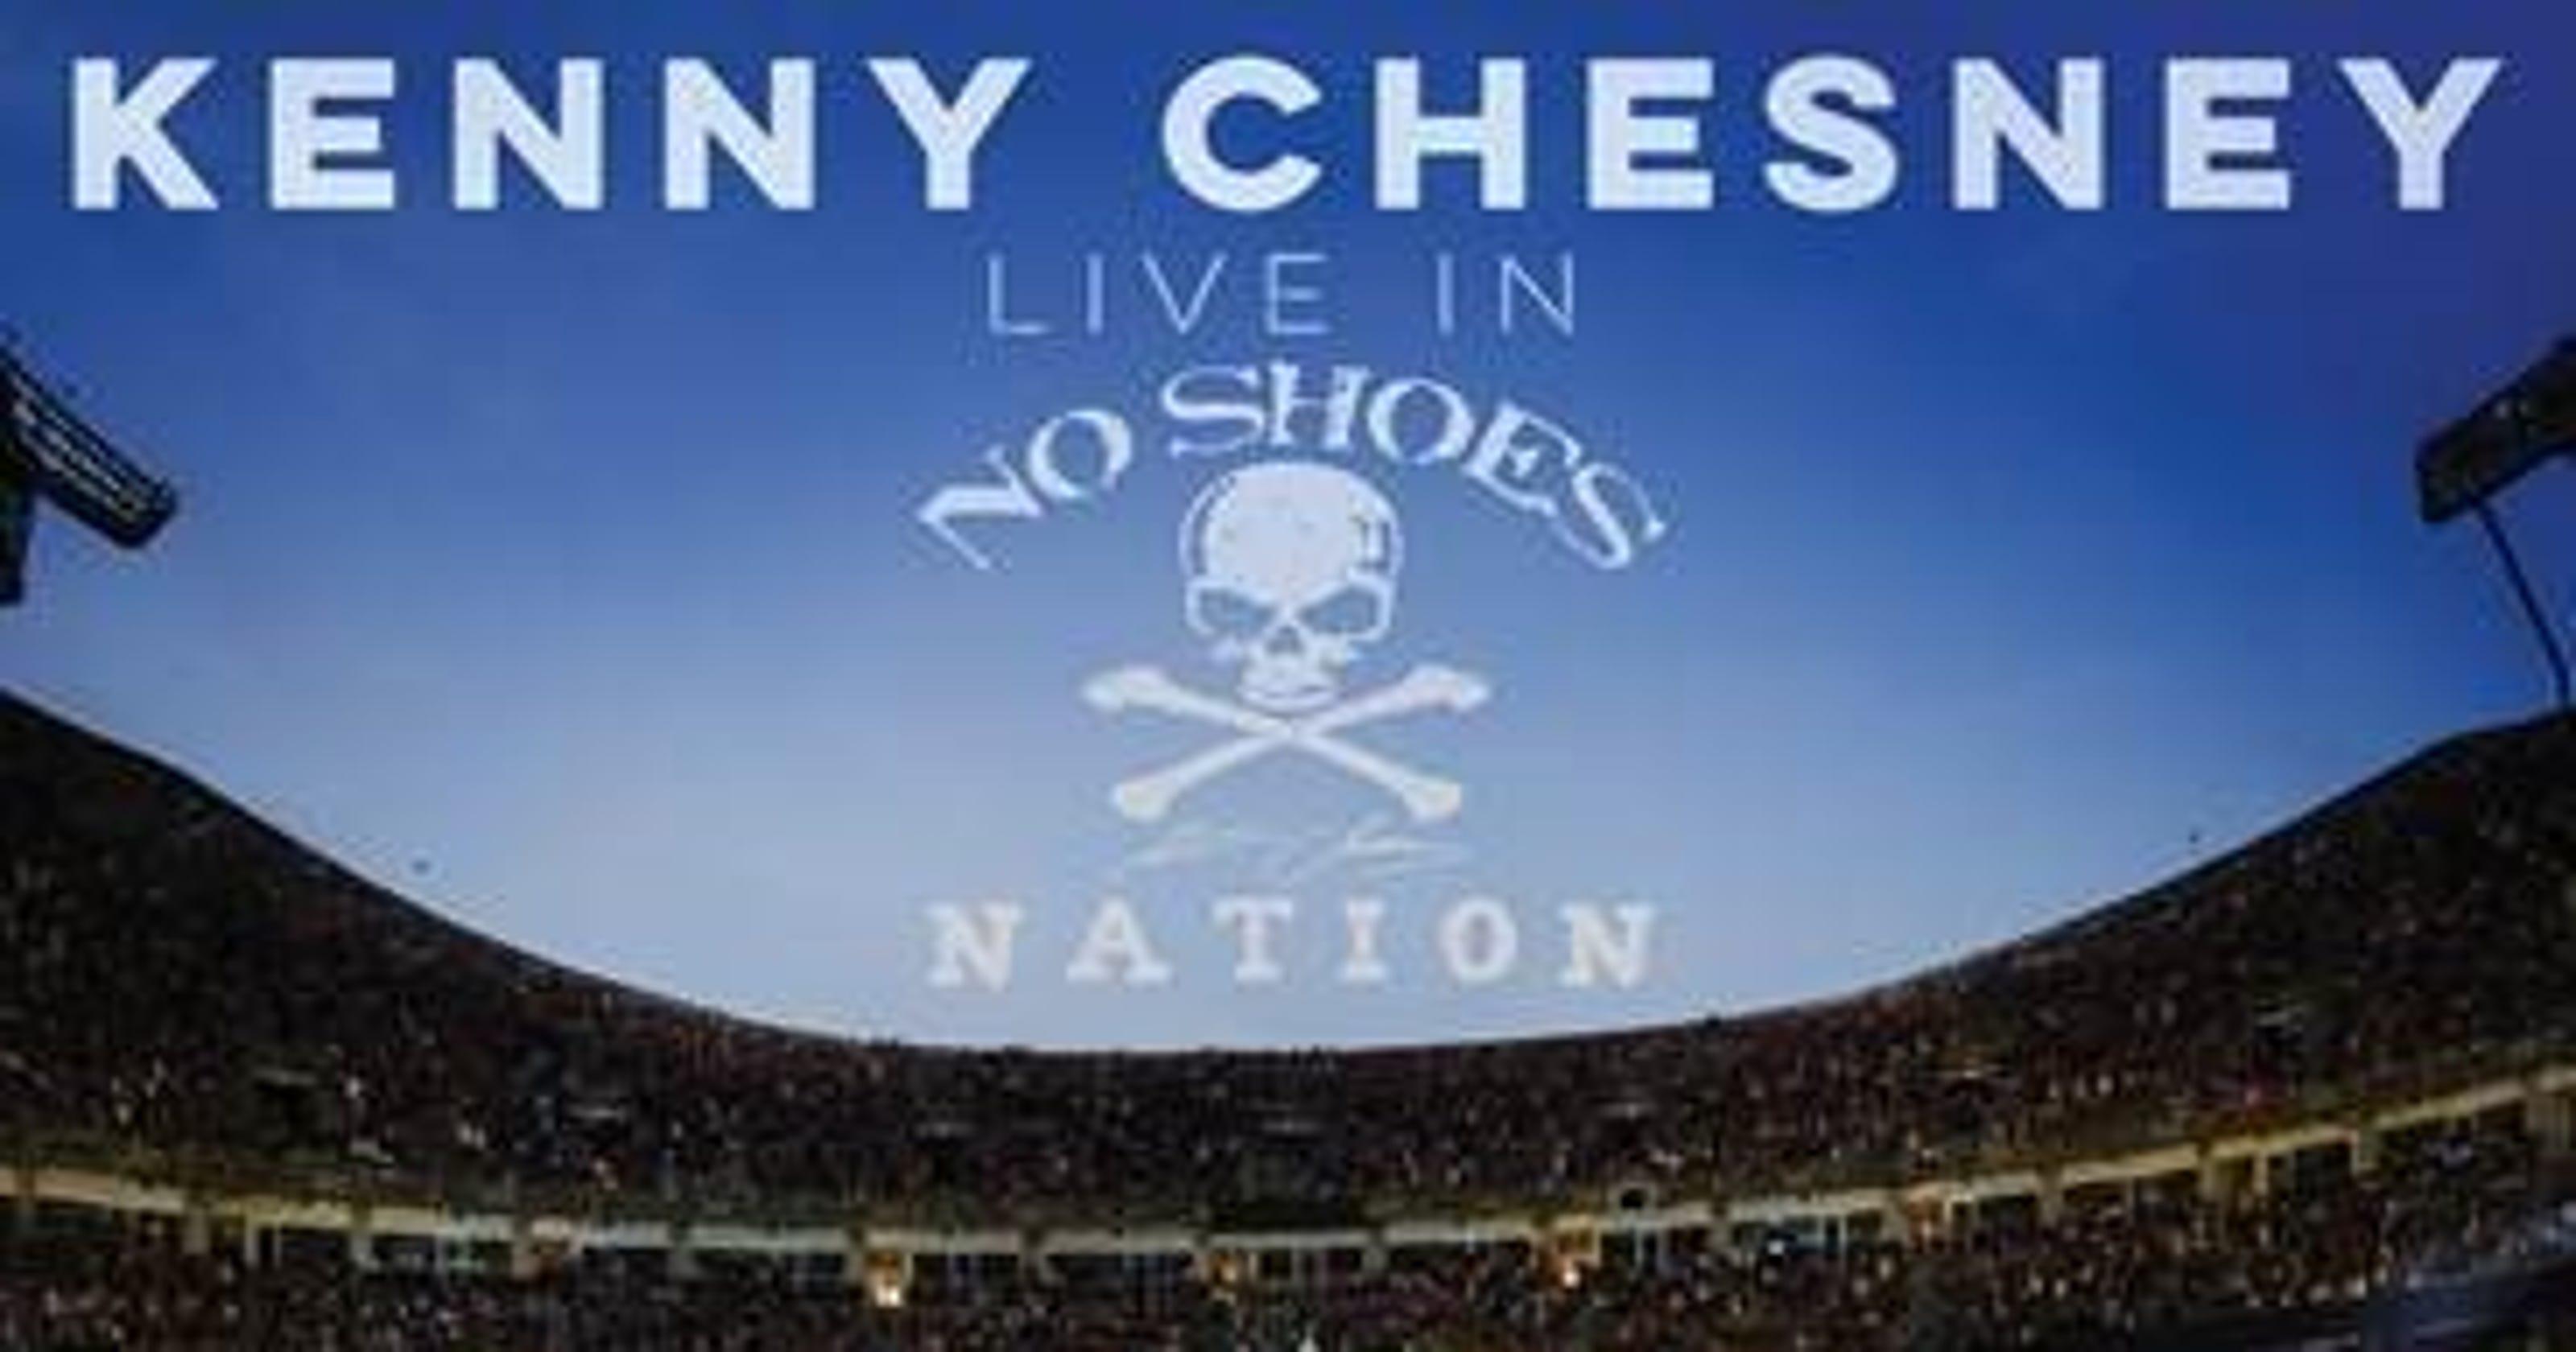 Lambeau Field Makes The Cut On Kenny Chesneys New Live Album